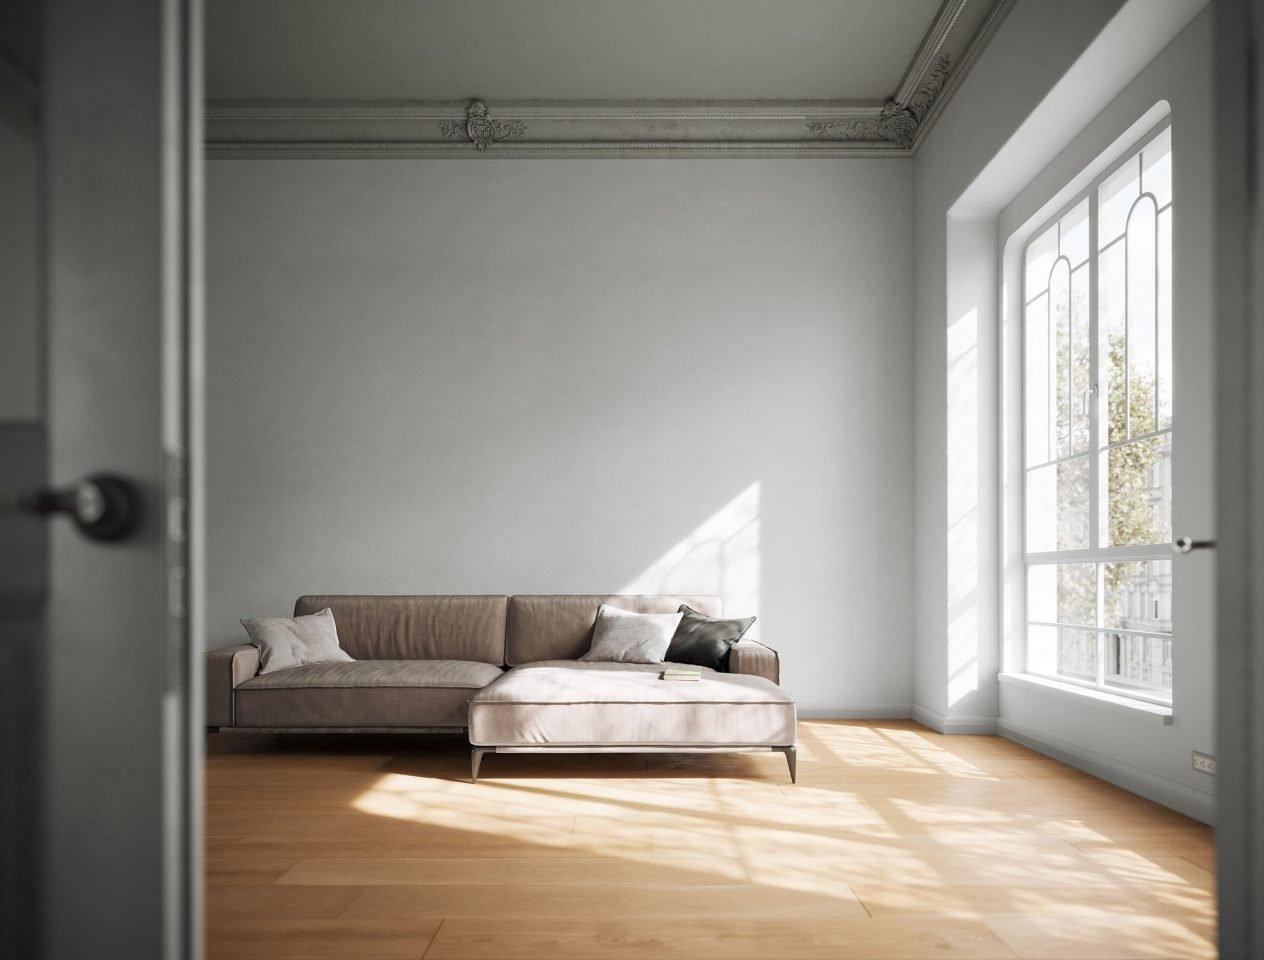 sala divano render 3D